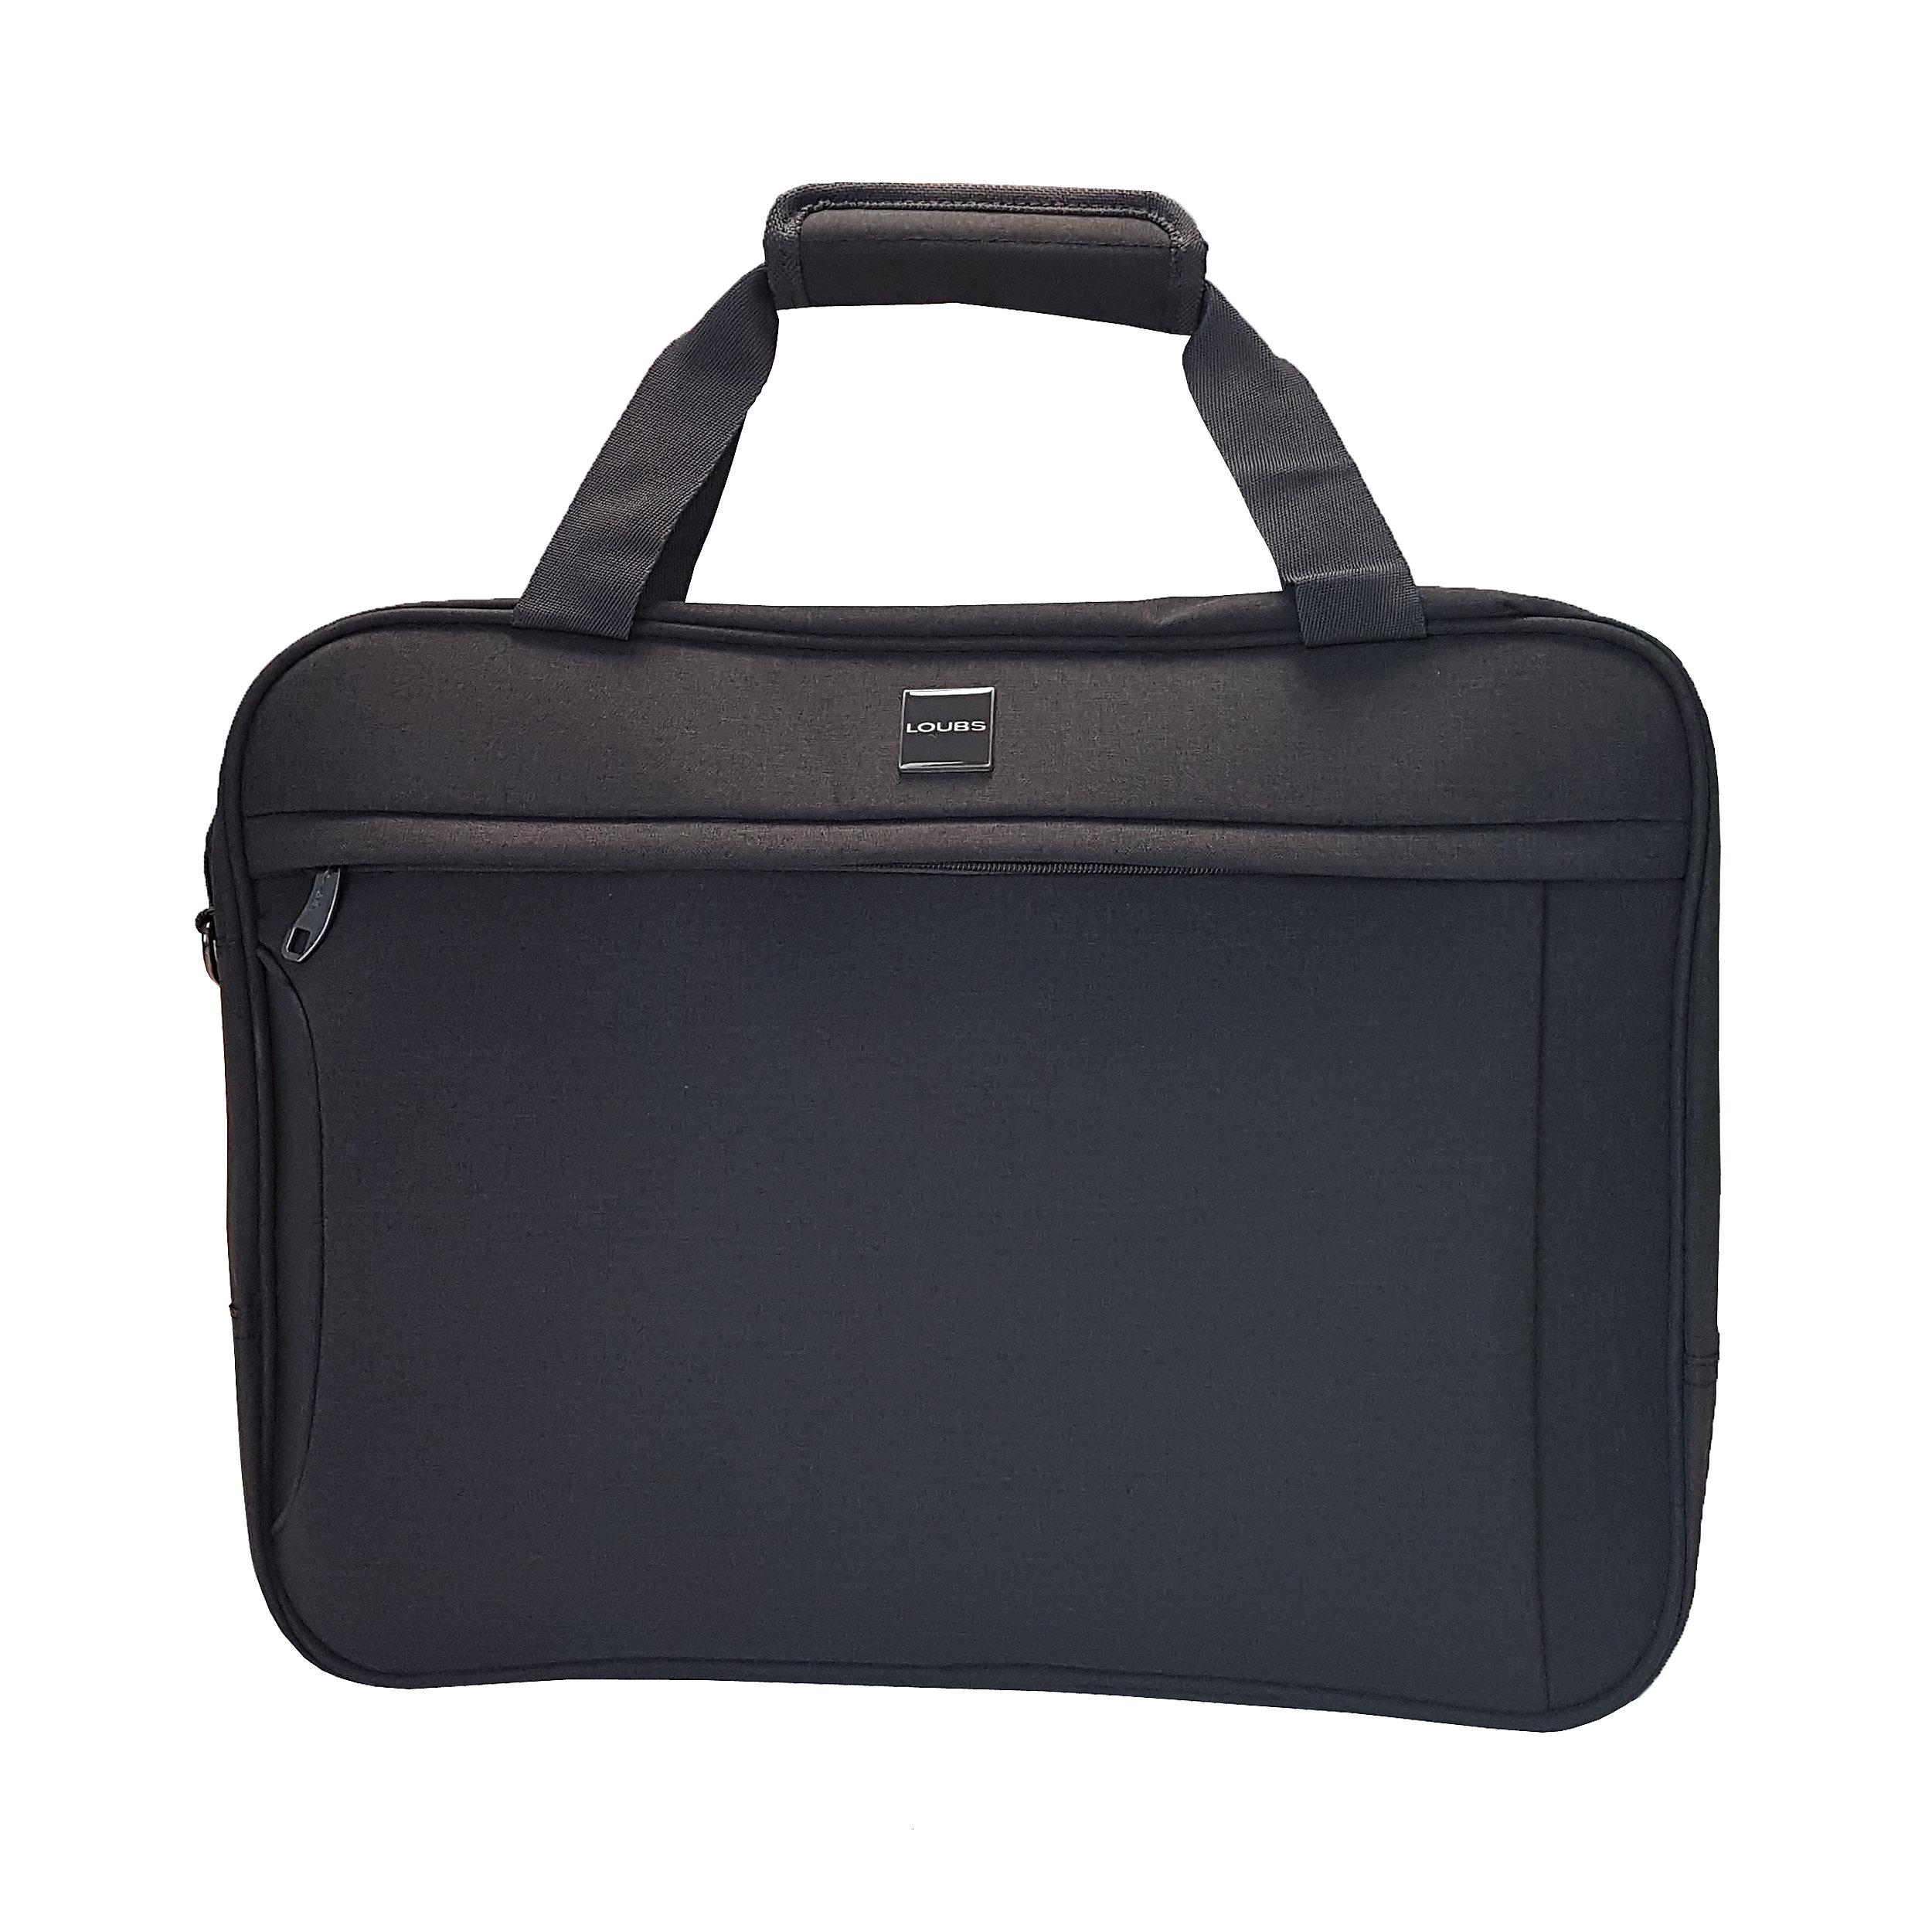 Bordtasche mit 4 Rollen Loubs Darwin XS 25 Liter